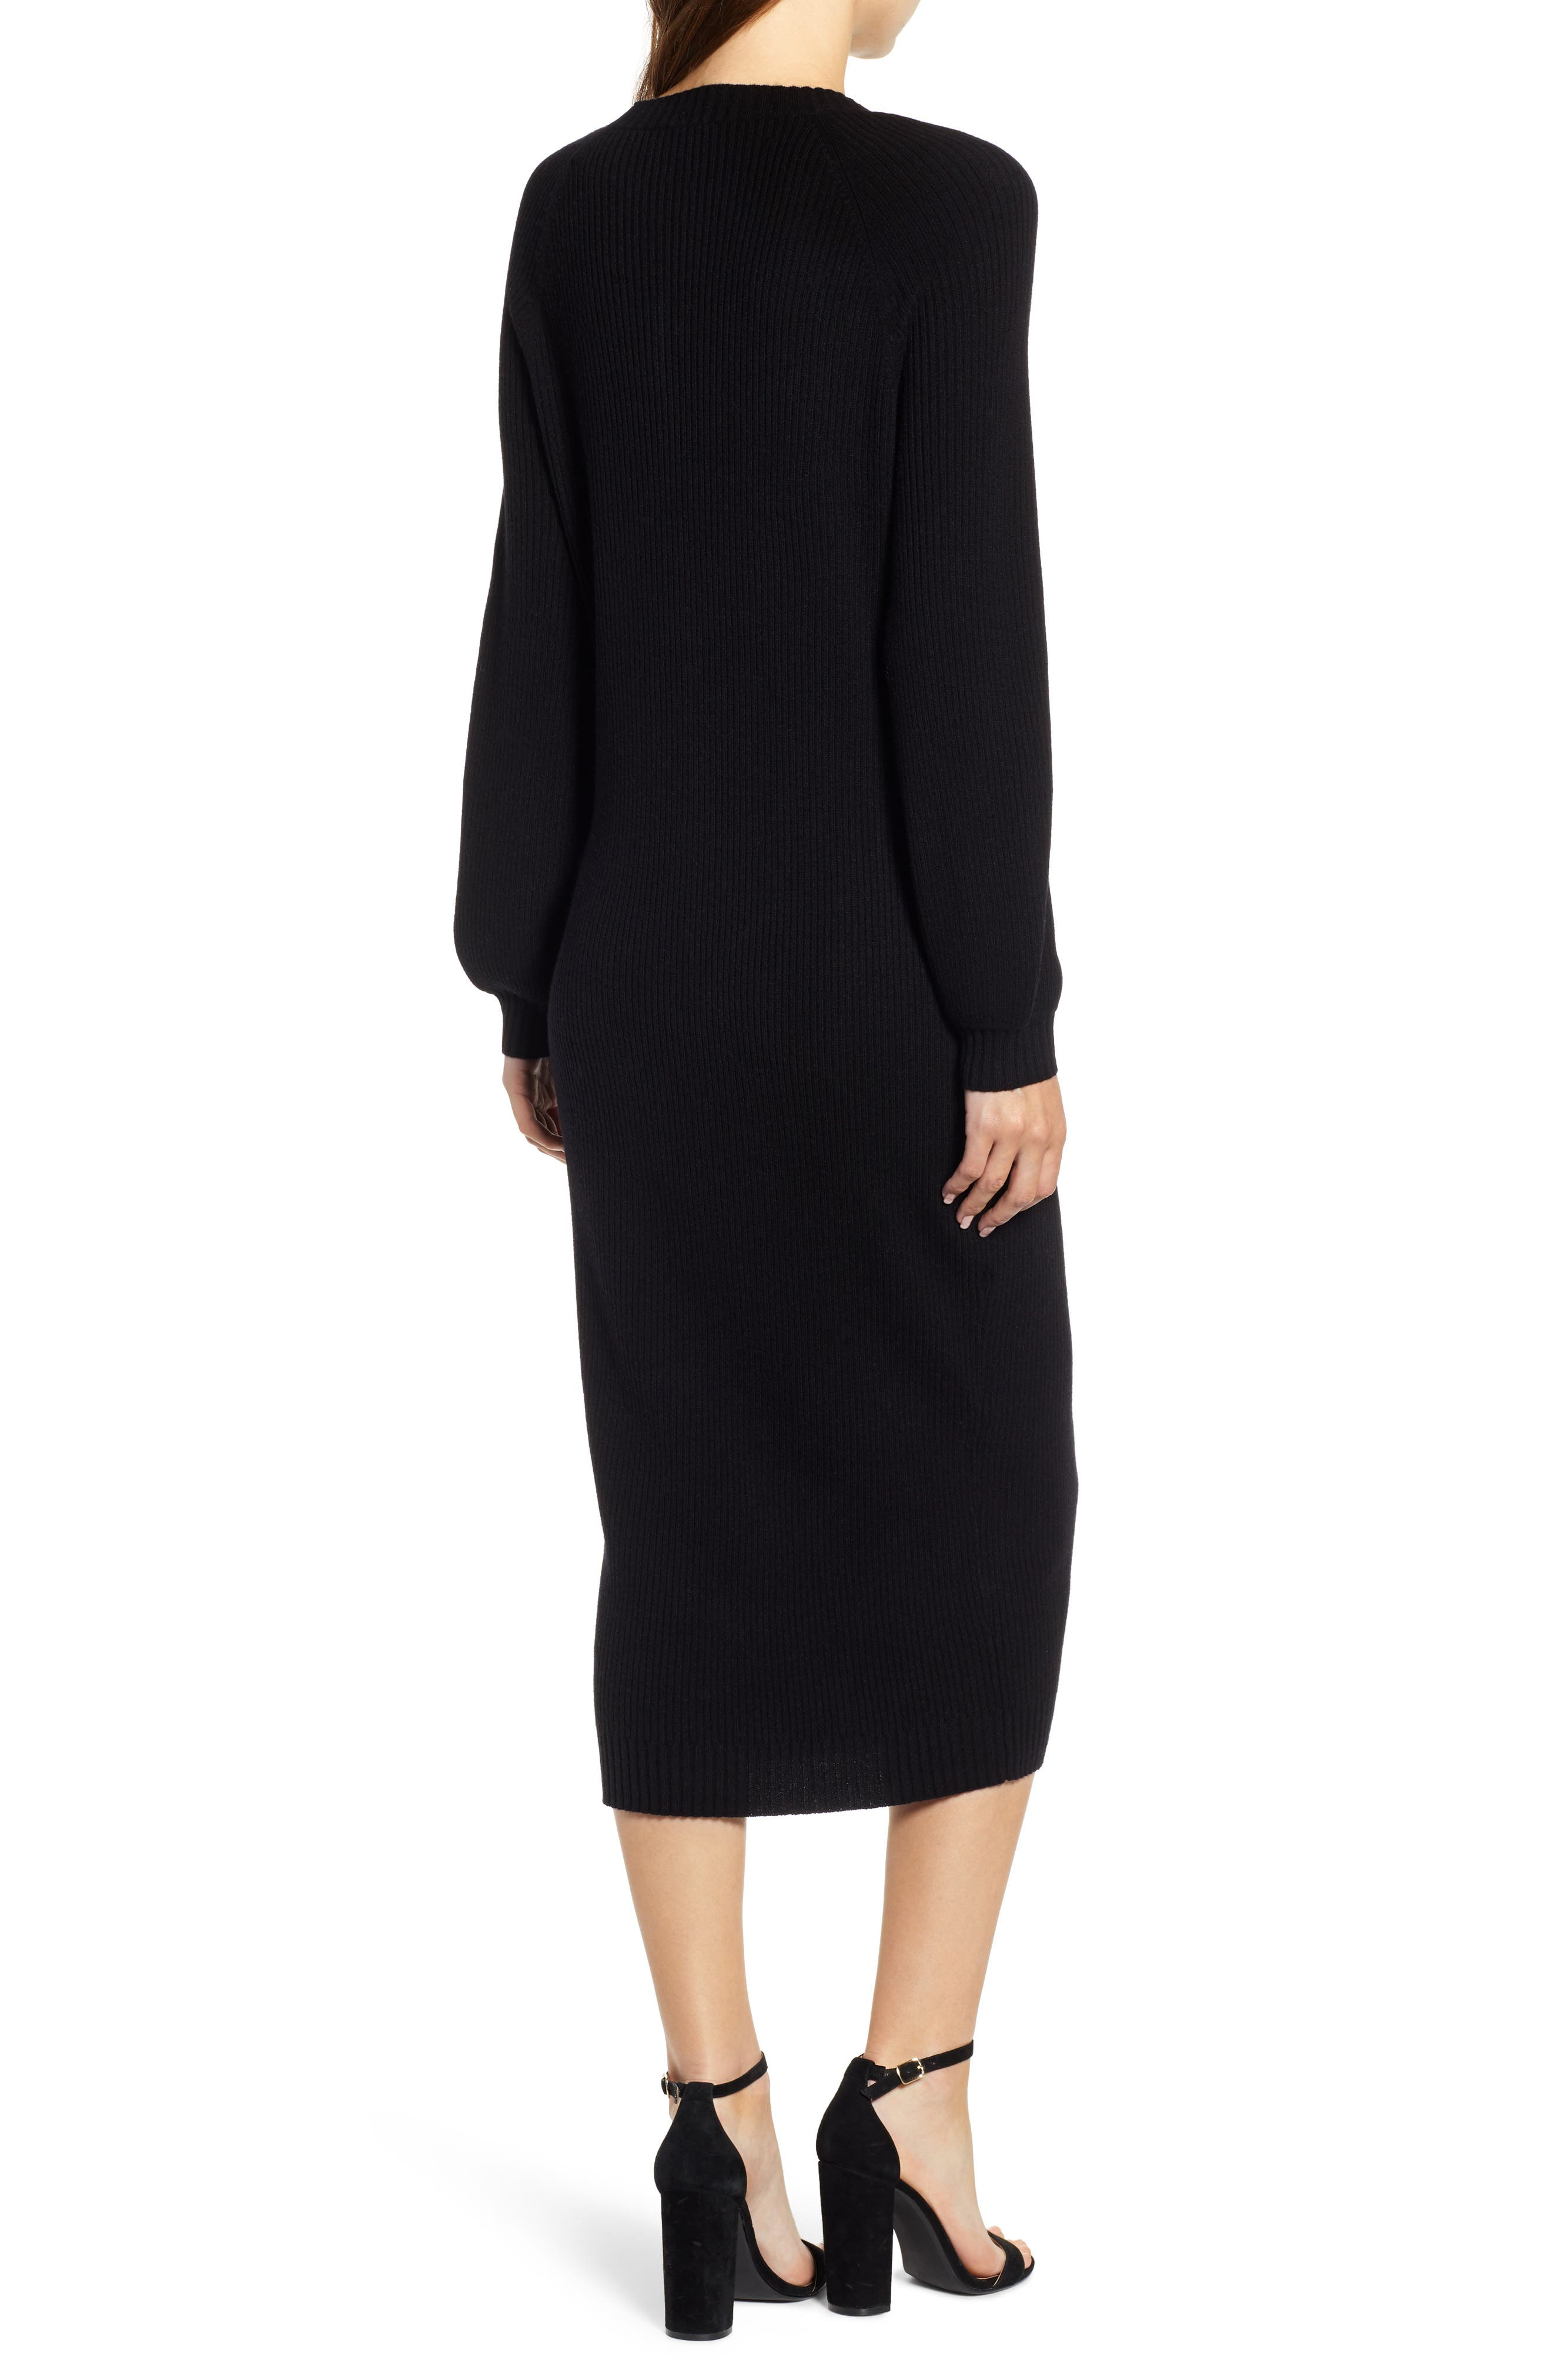 Quaid Knit Sweater Dress,                             Alternate thumbnail 2, color,                             TRUE BLACK